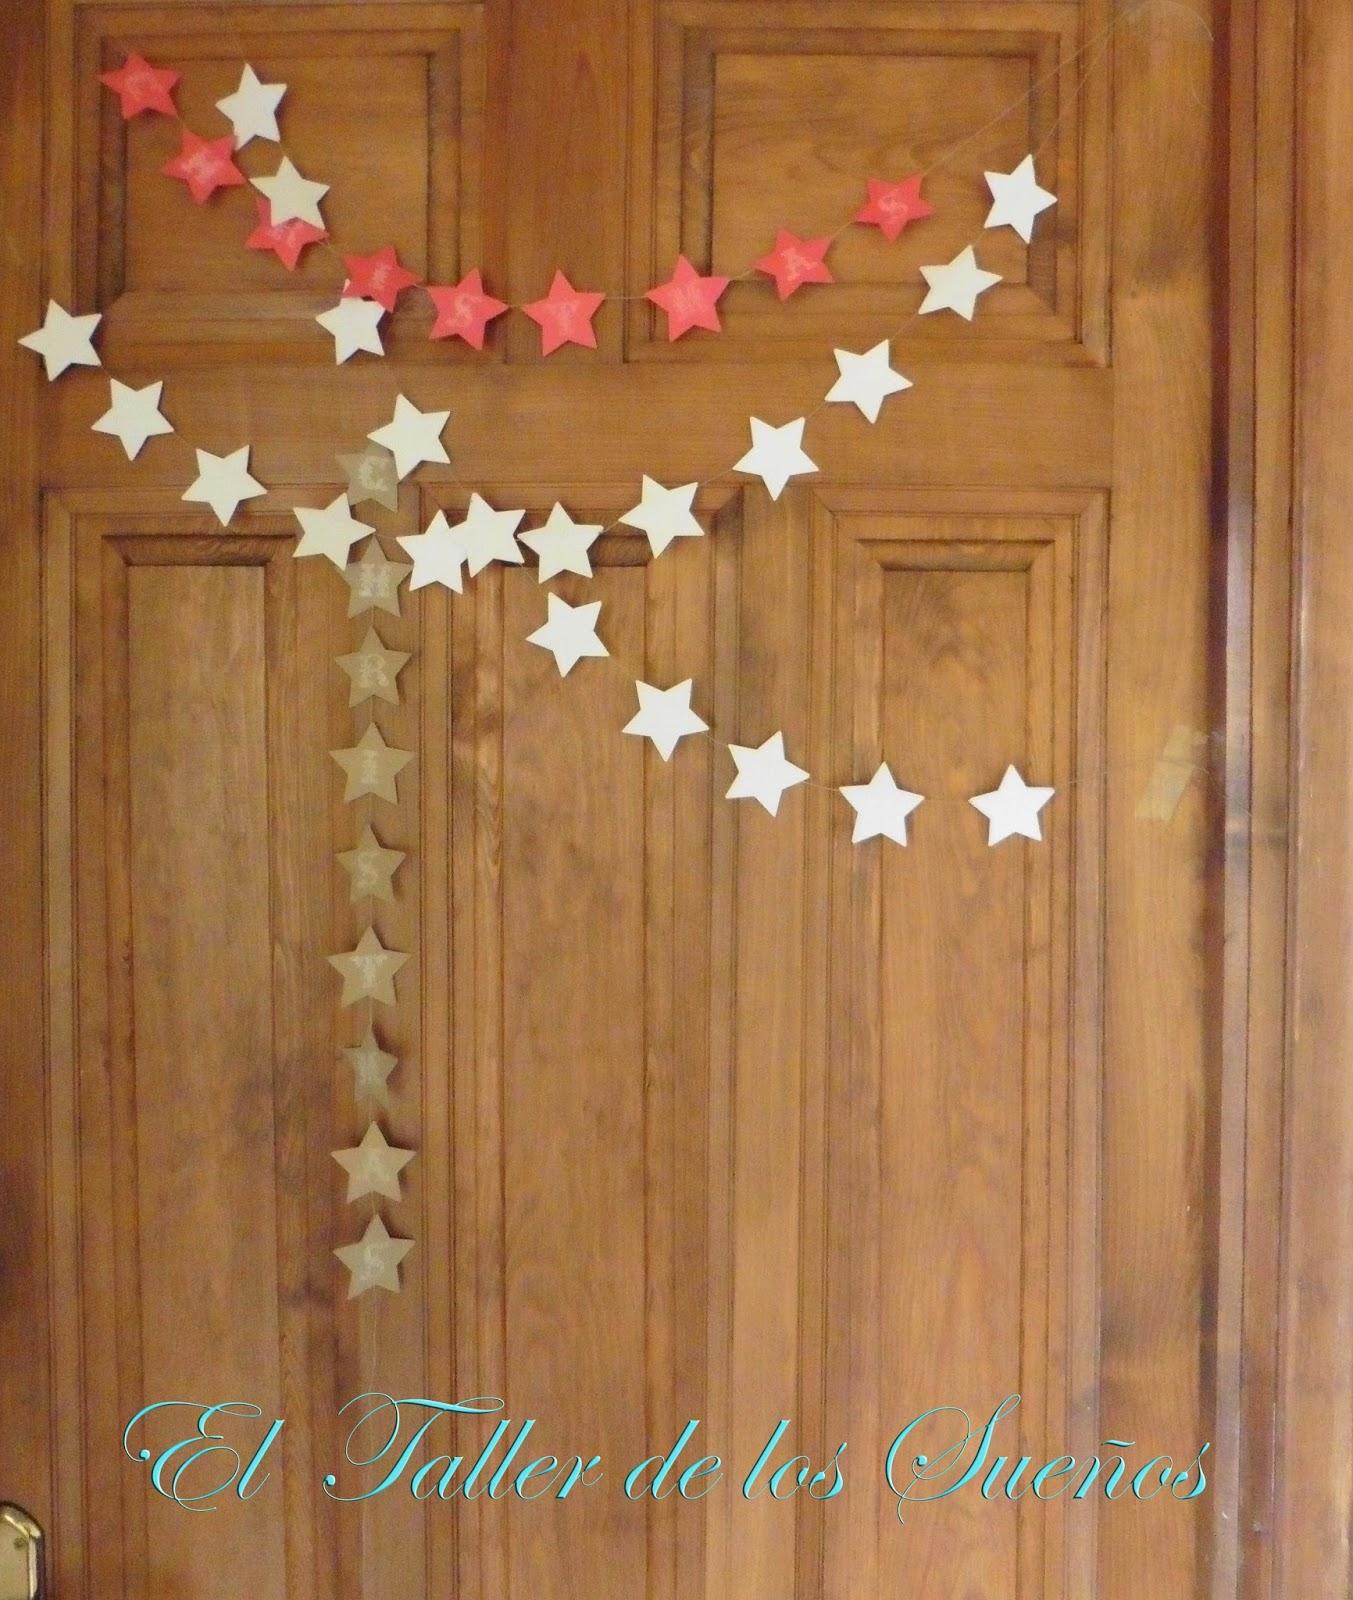 Taller de sue os decoraci n navide a diy guirnaldas de - Decoracion navidena diy ...